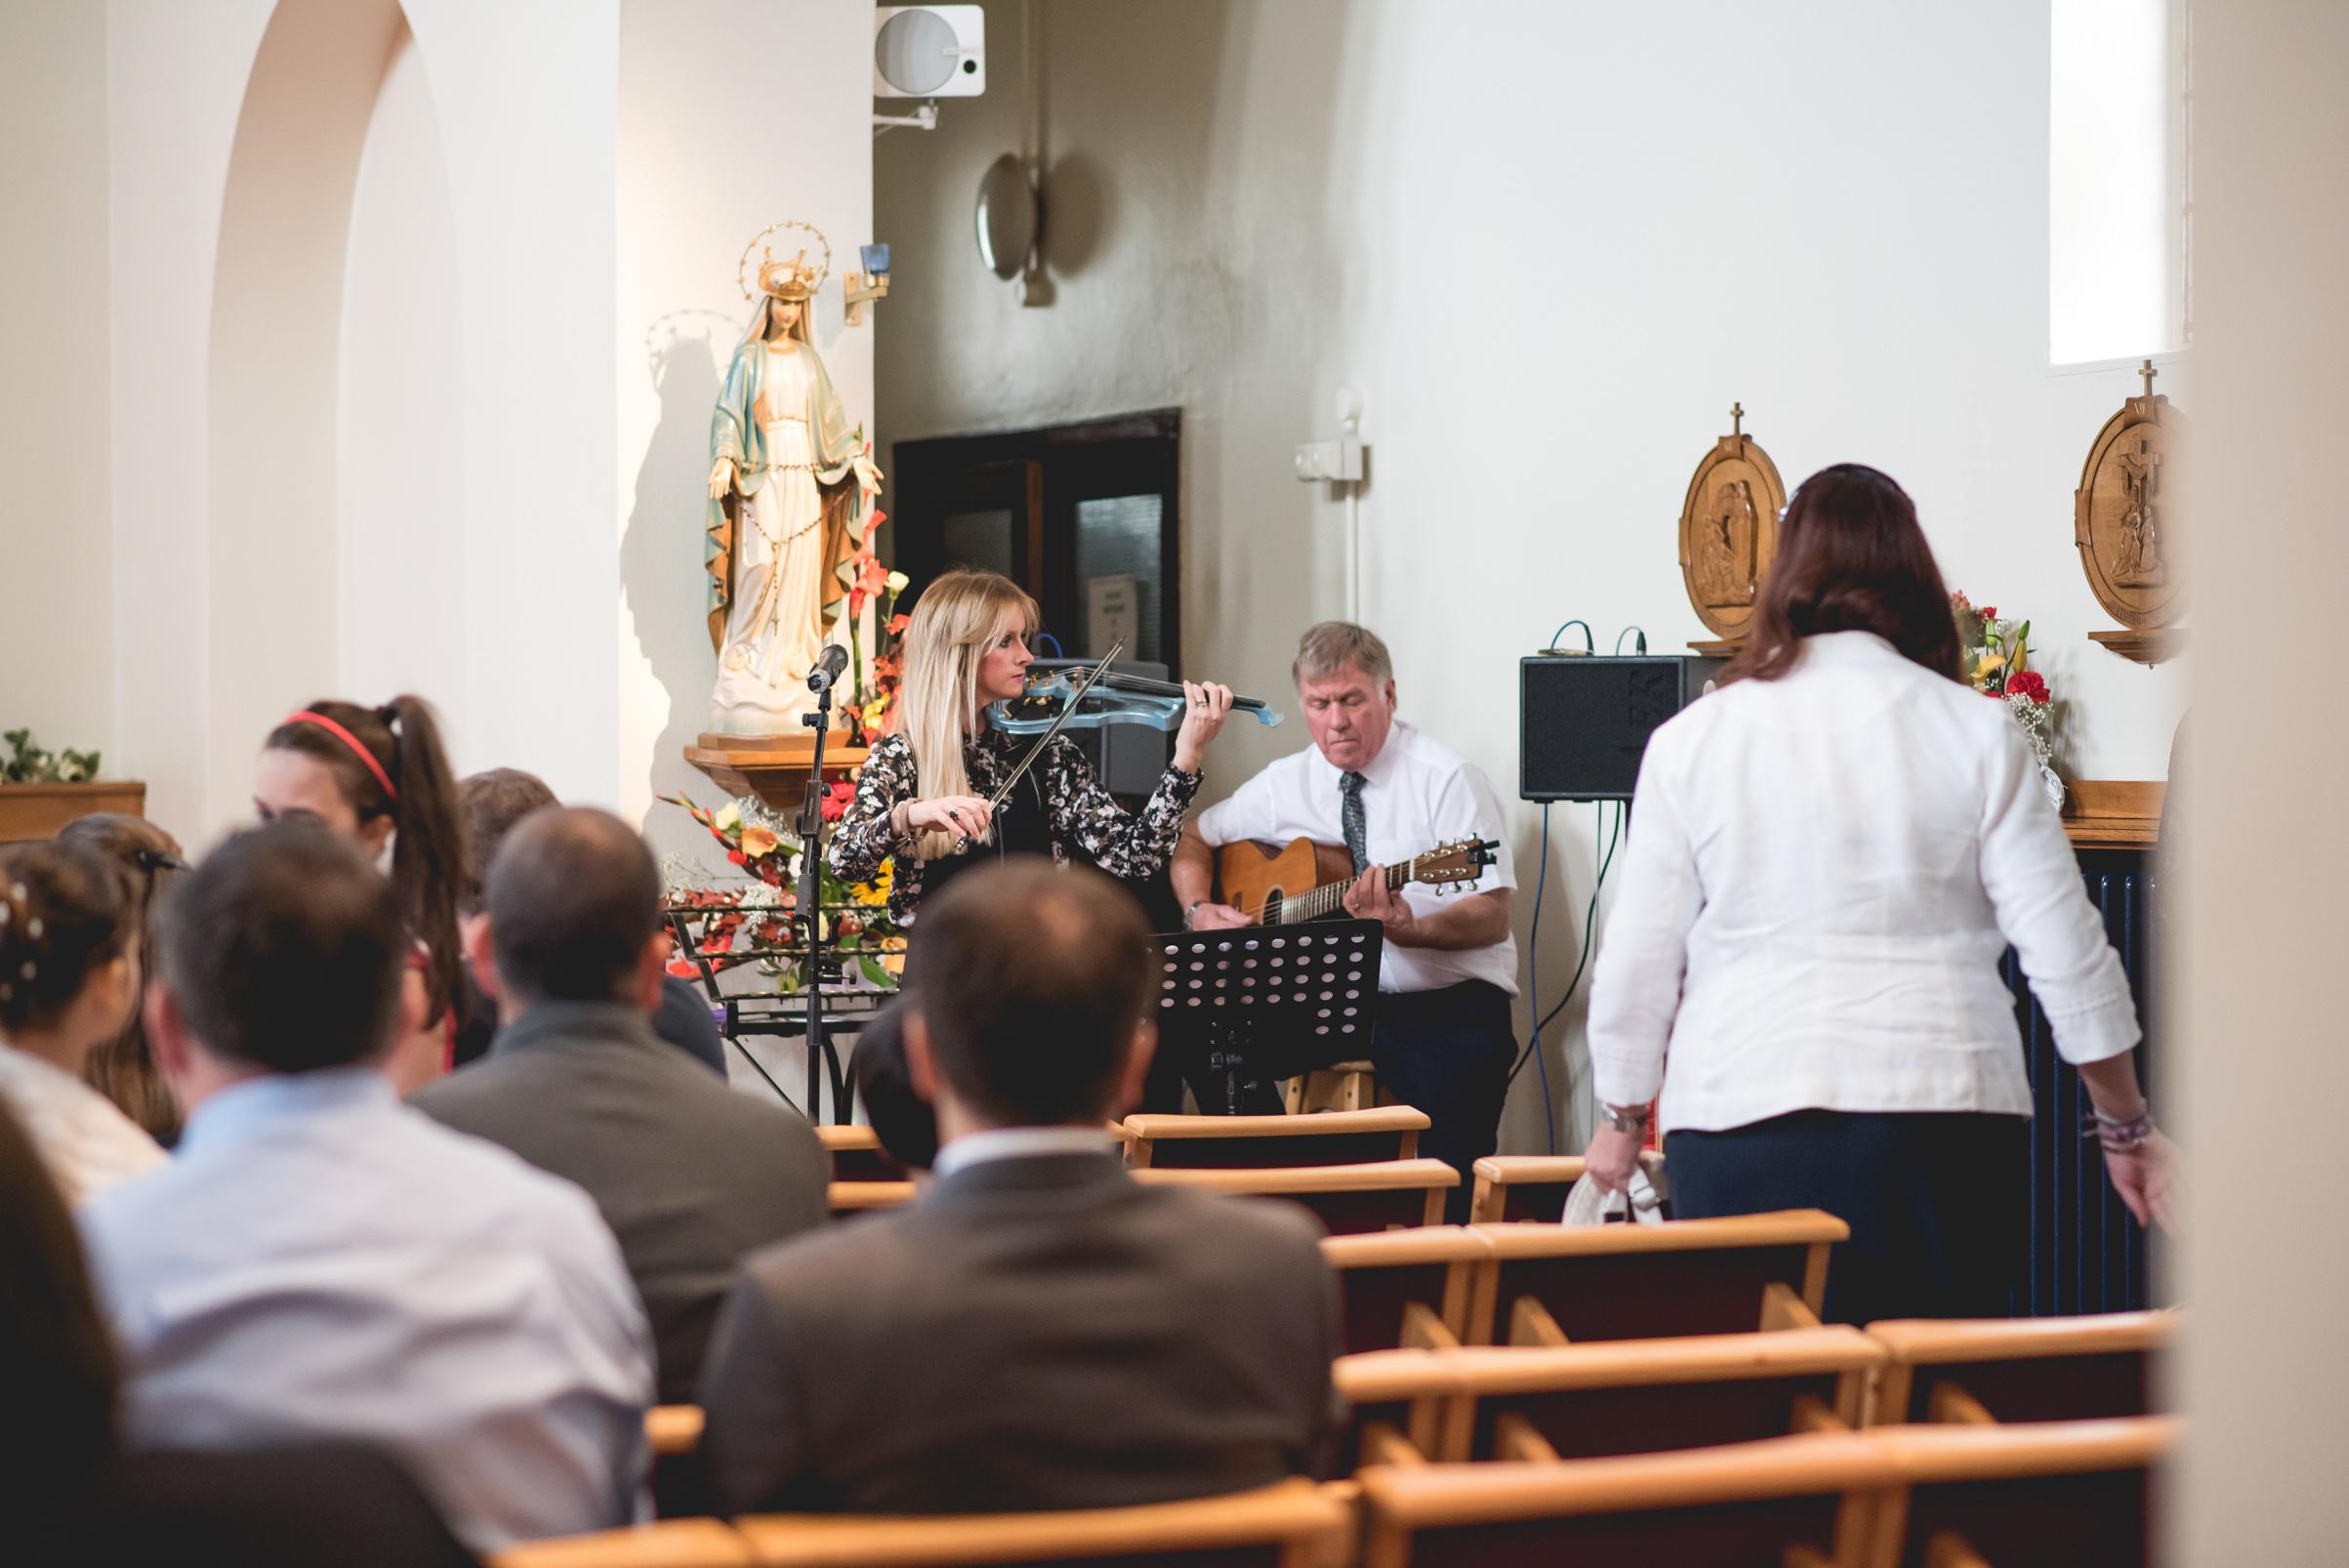 The+Fairlawns+wedding+Aldridge+StLukes+Church-74.jpg